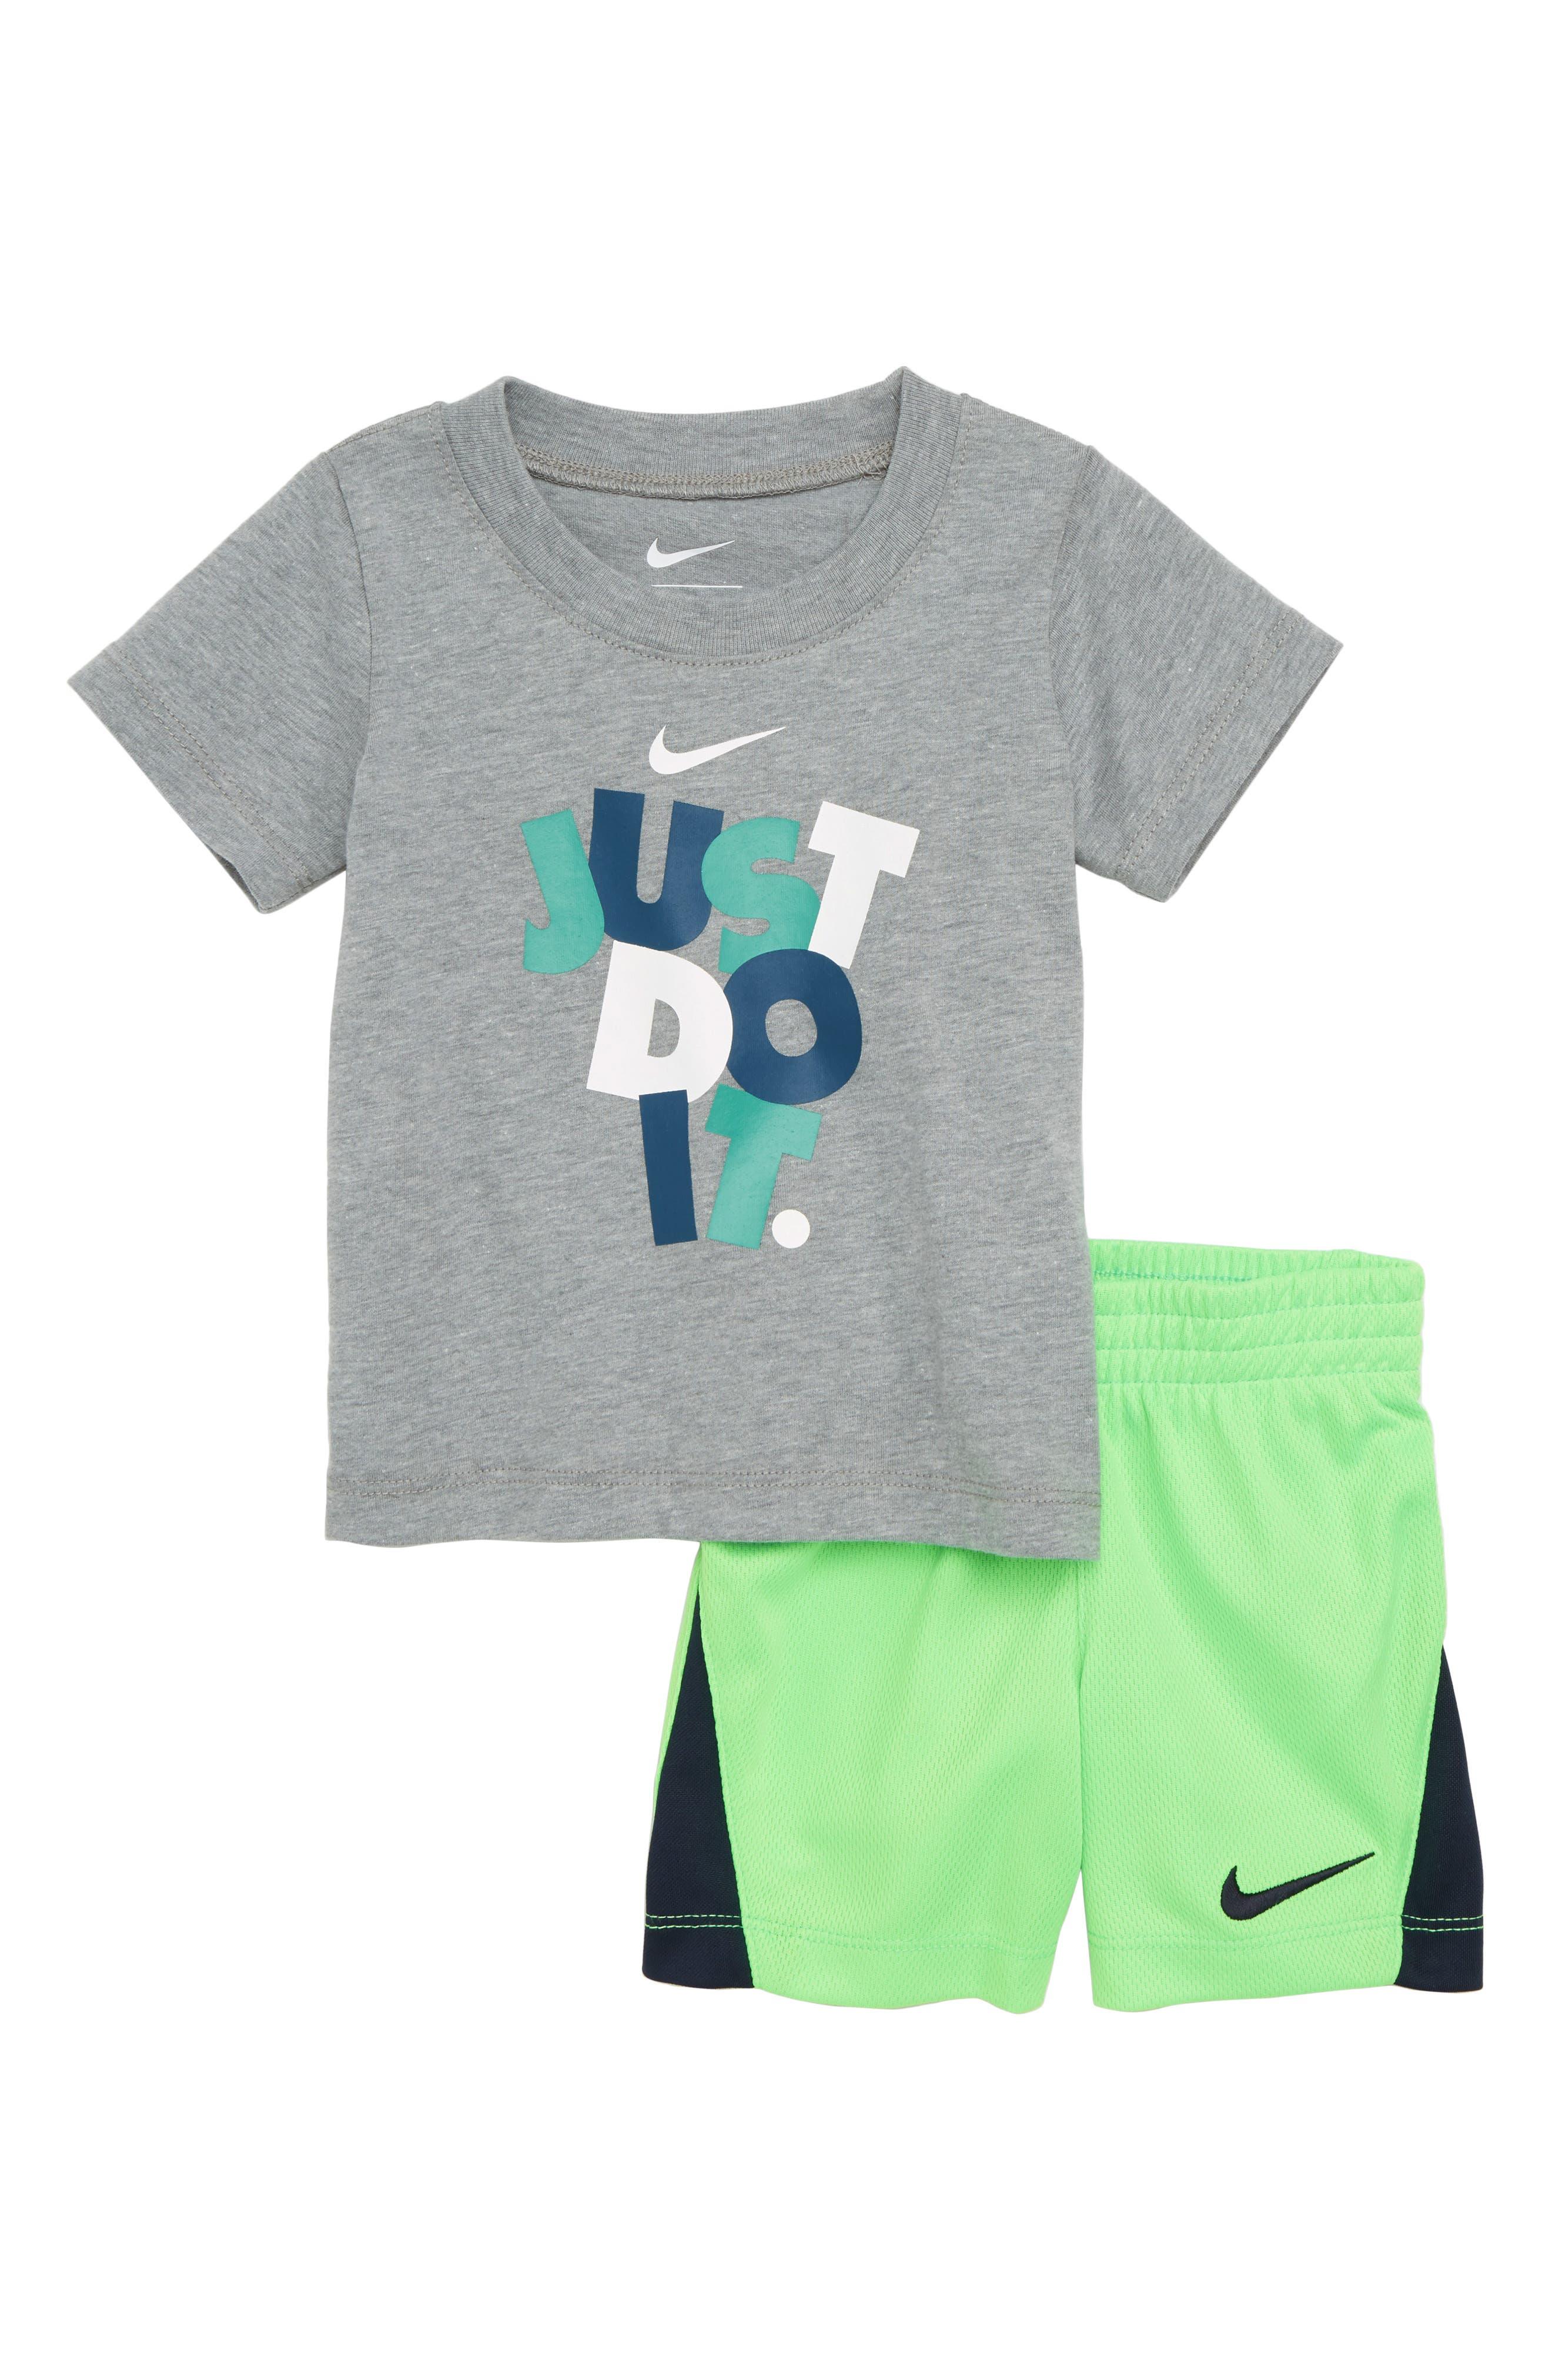 Nike Just Do It T-Shirt & Mesh Shorts Set (Baby)